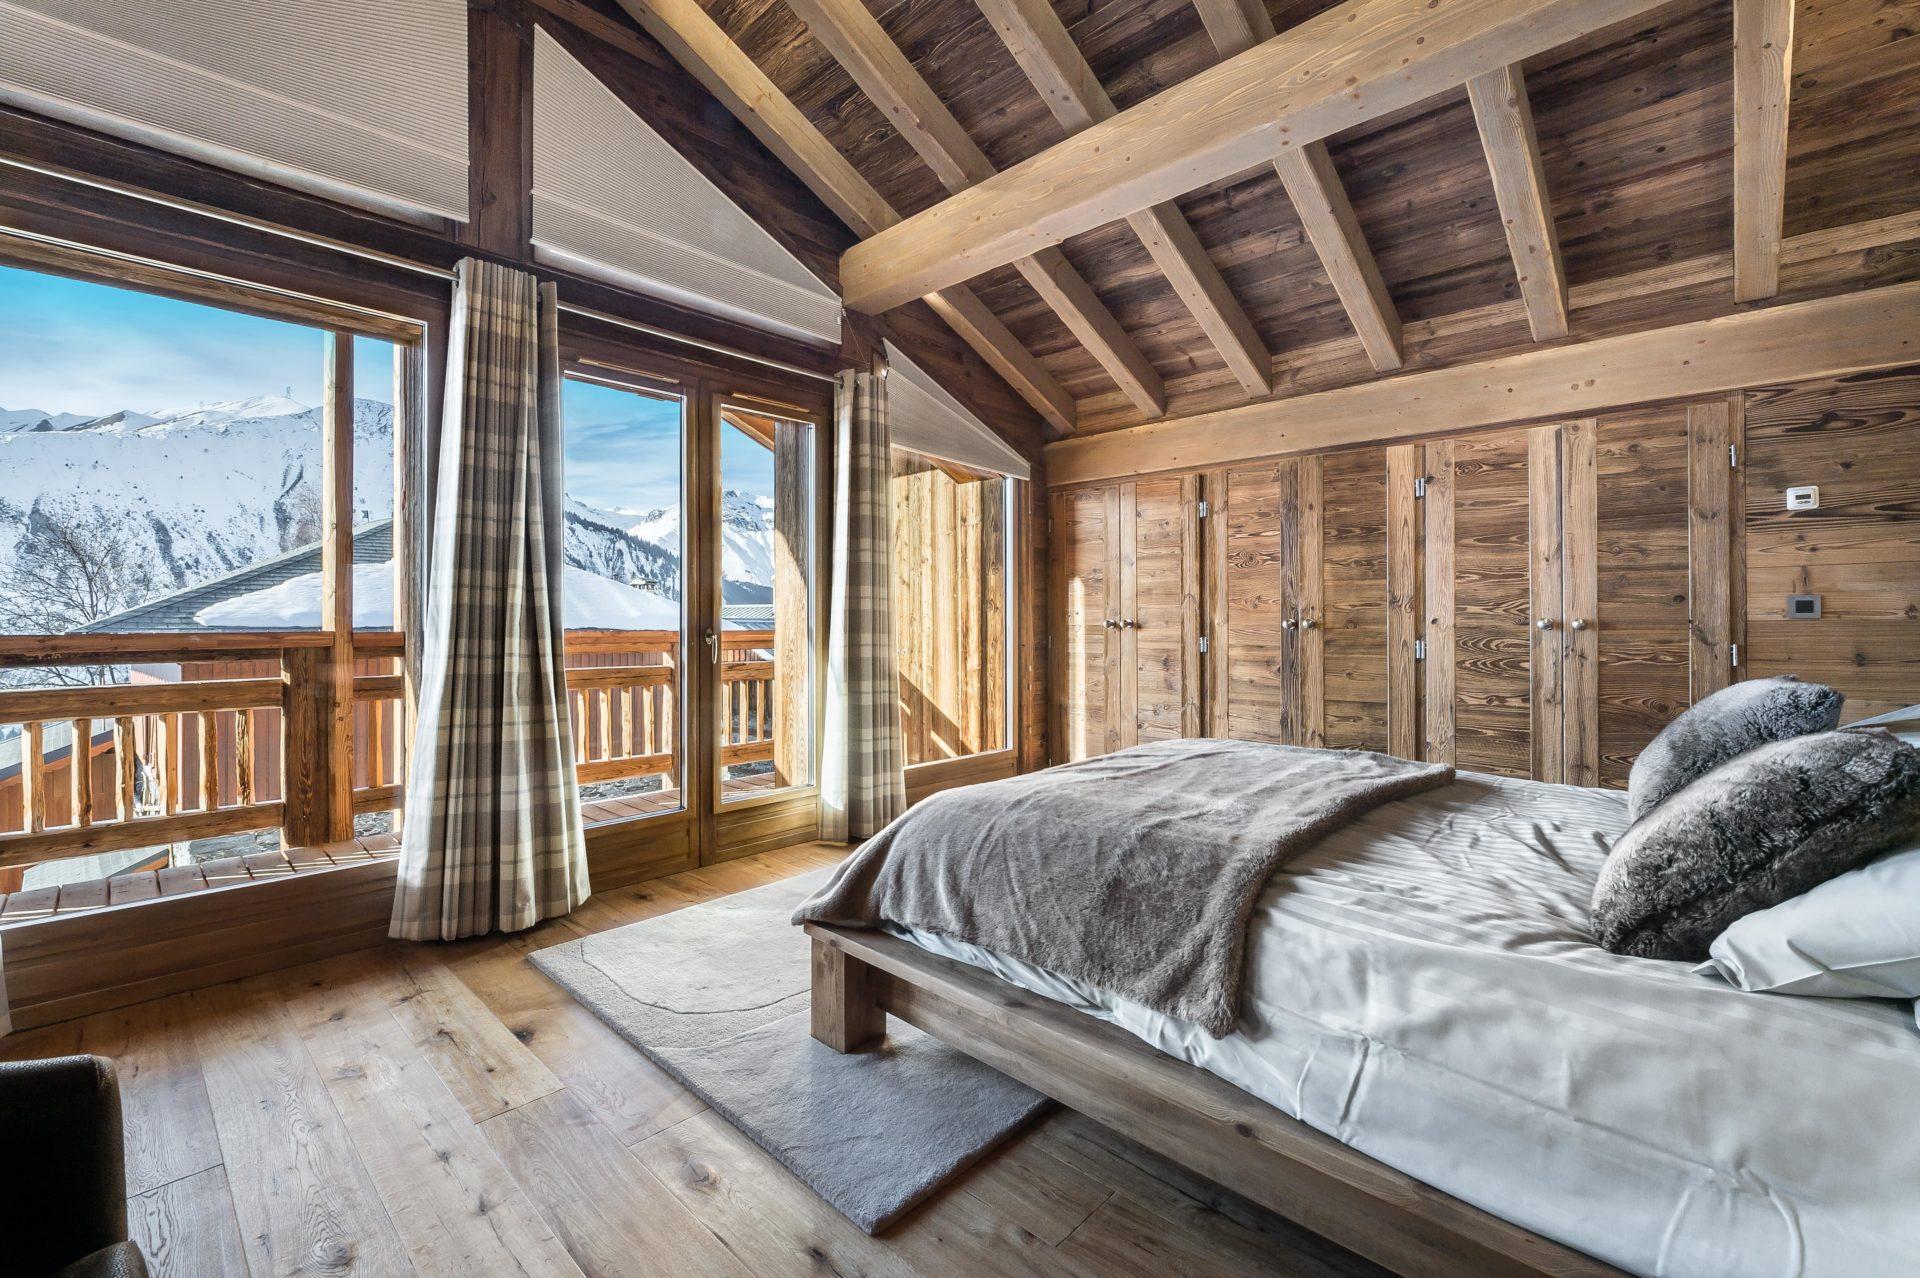 Chalet Chanterelle Chambre 1 Villarabout Saint Martin de Belleville, Savoie